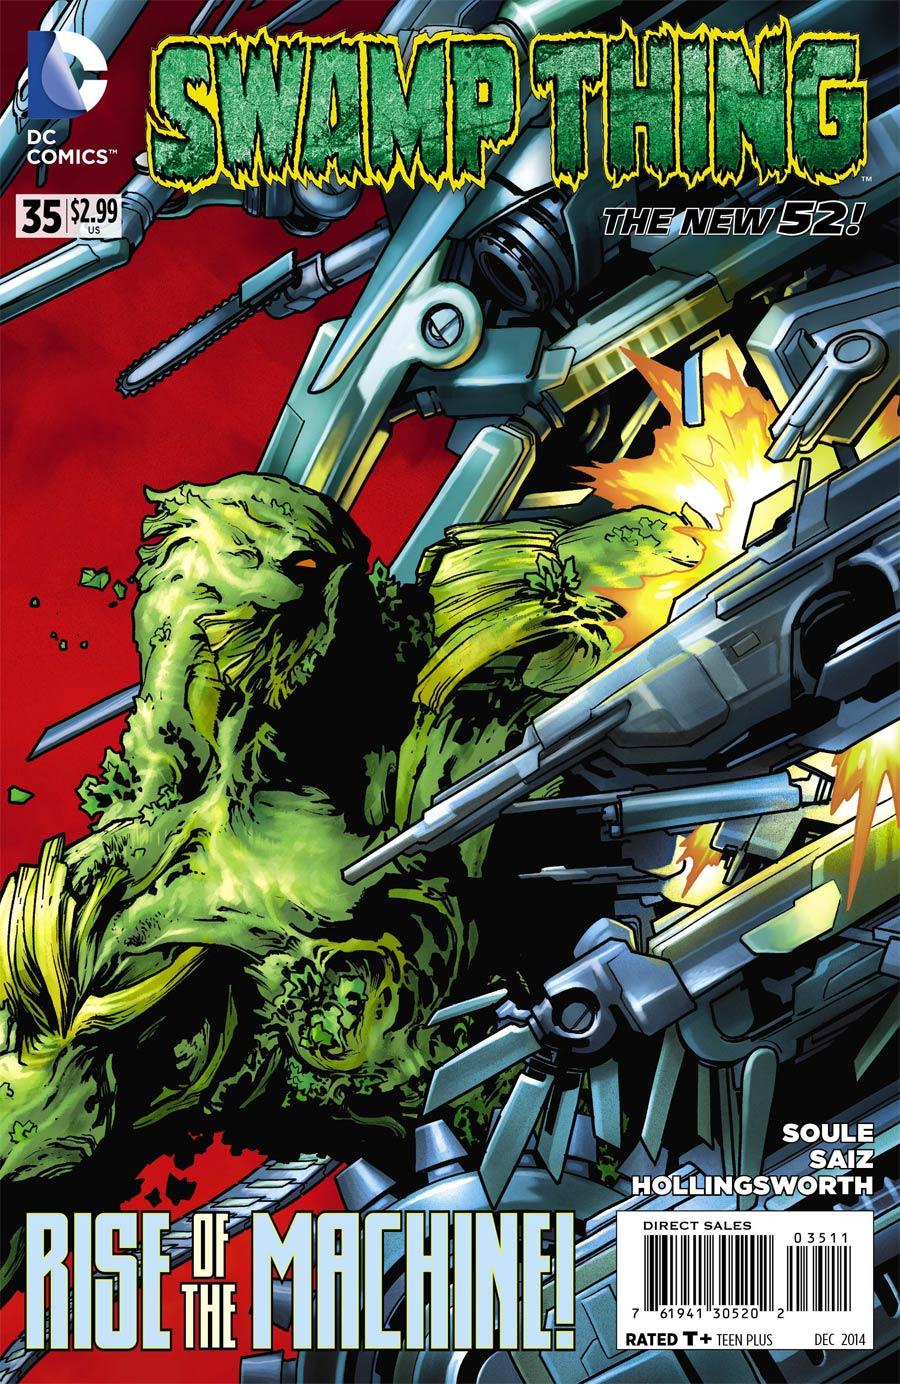 Swamp Thing Vol 5 #35